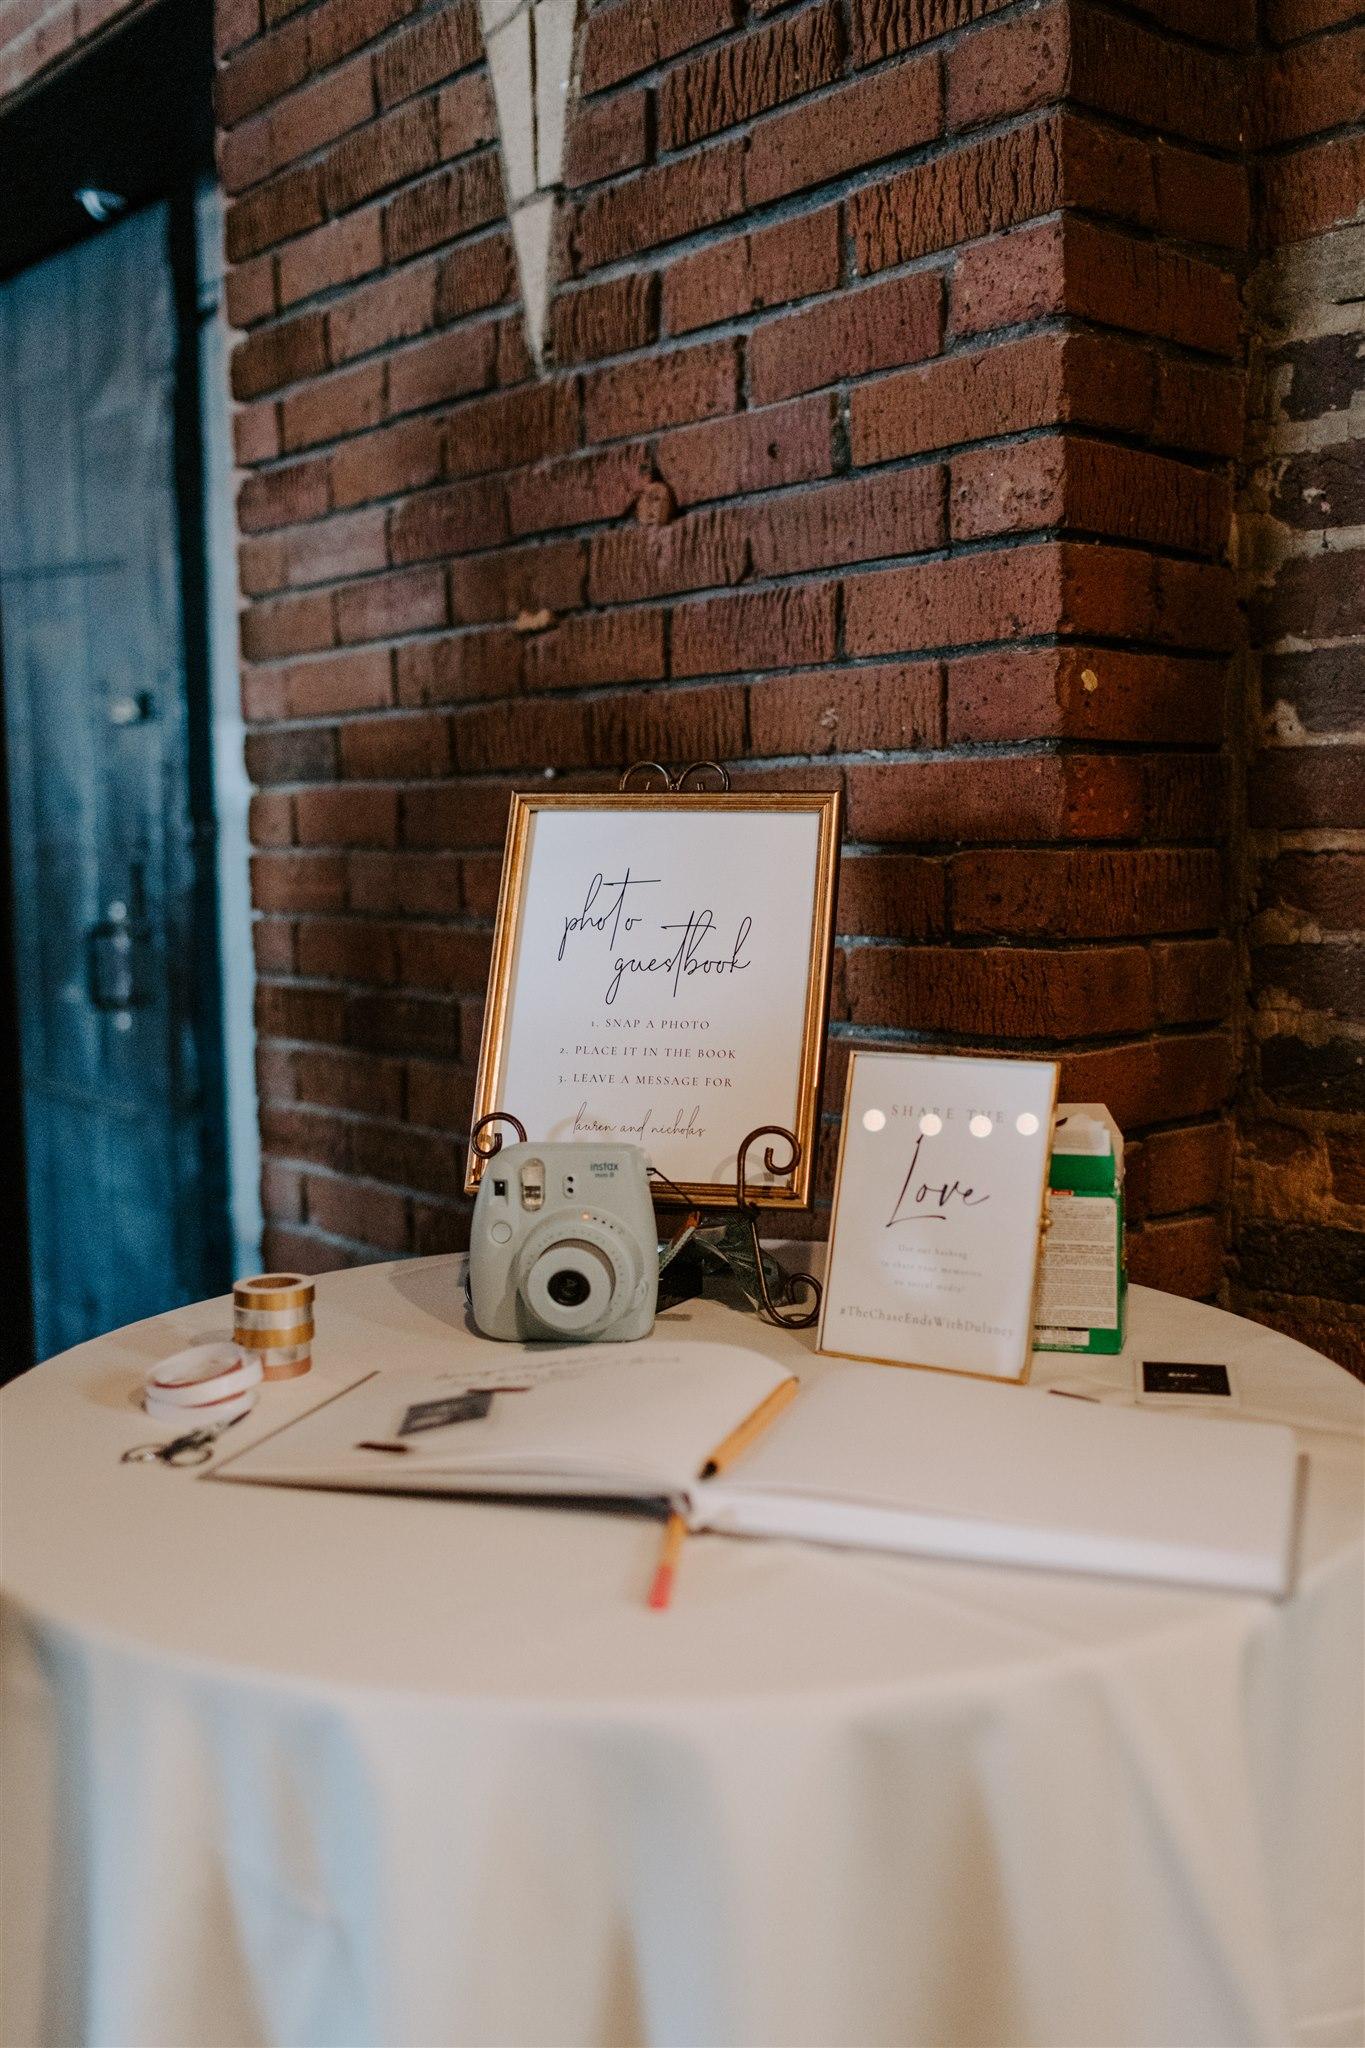 Polaroid wedding guest book